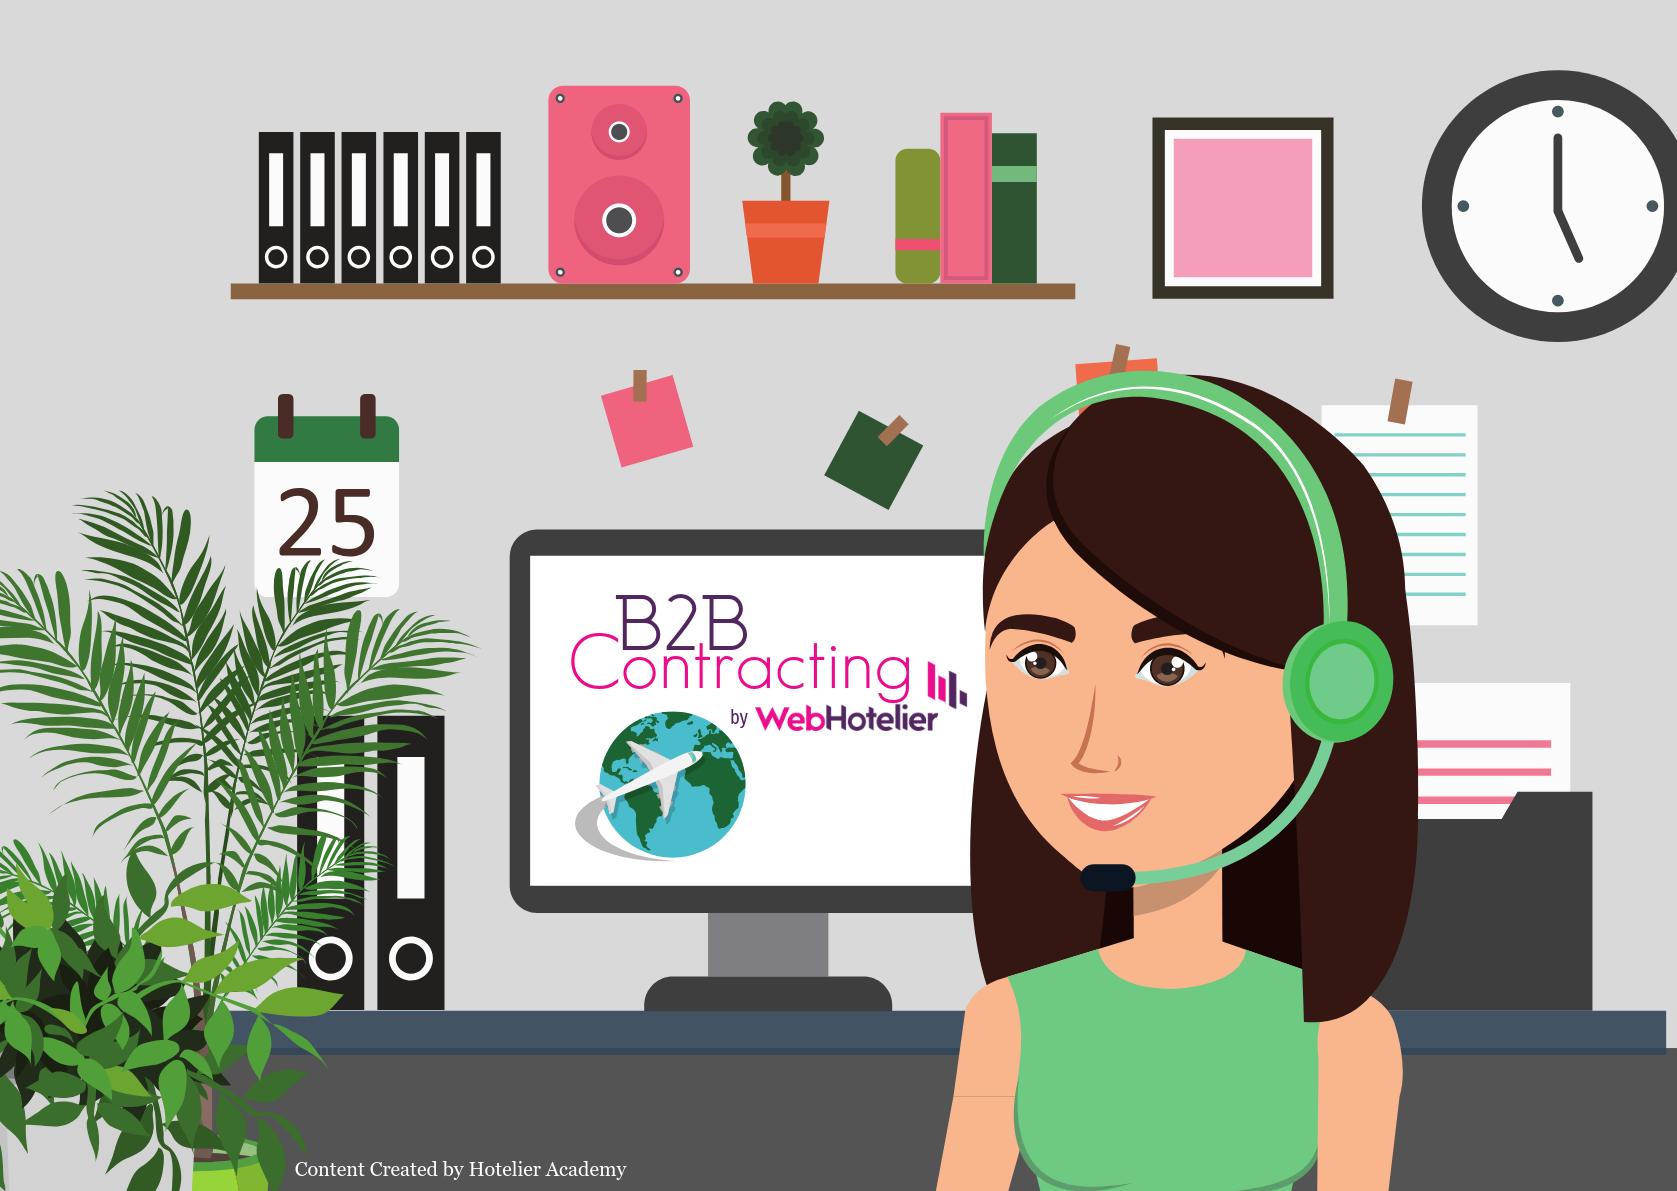 b2b contracting - Hotelier Academy